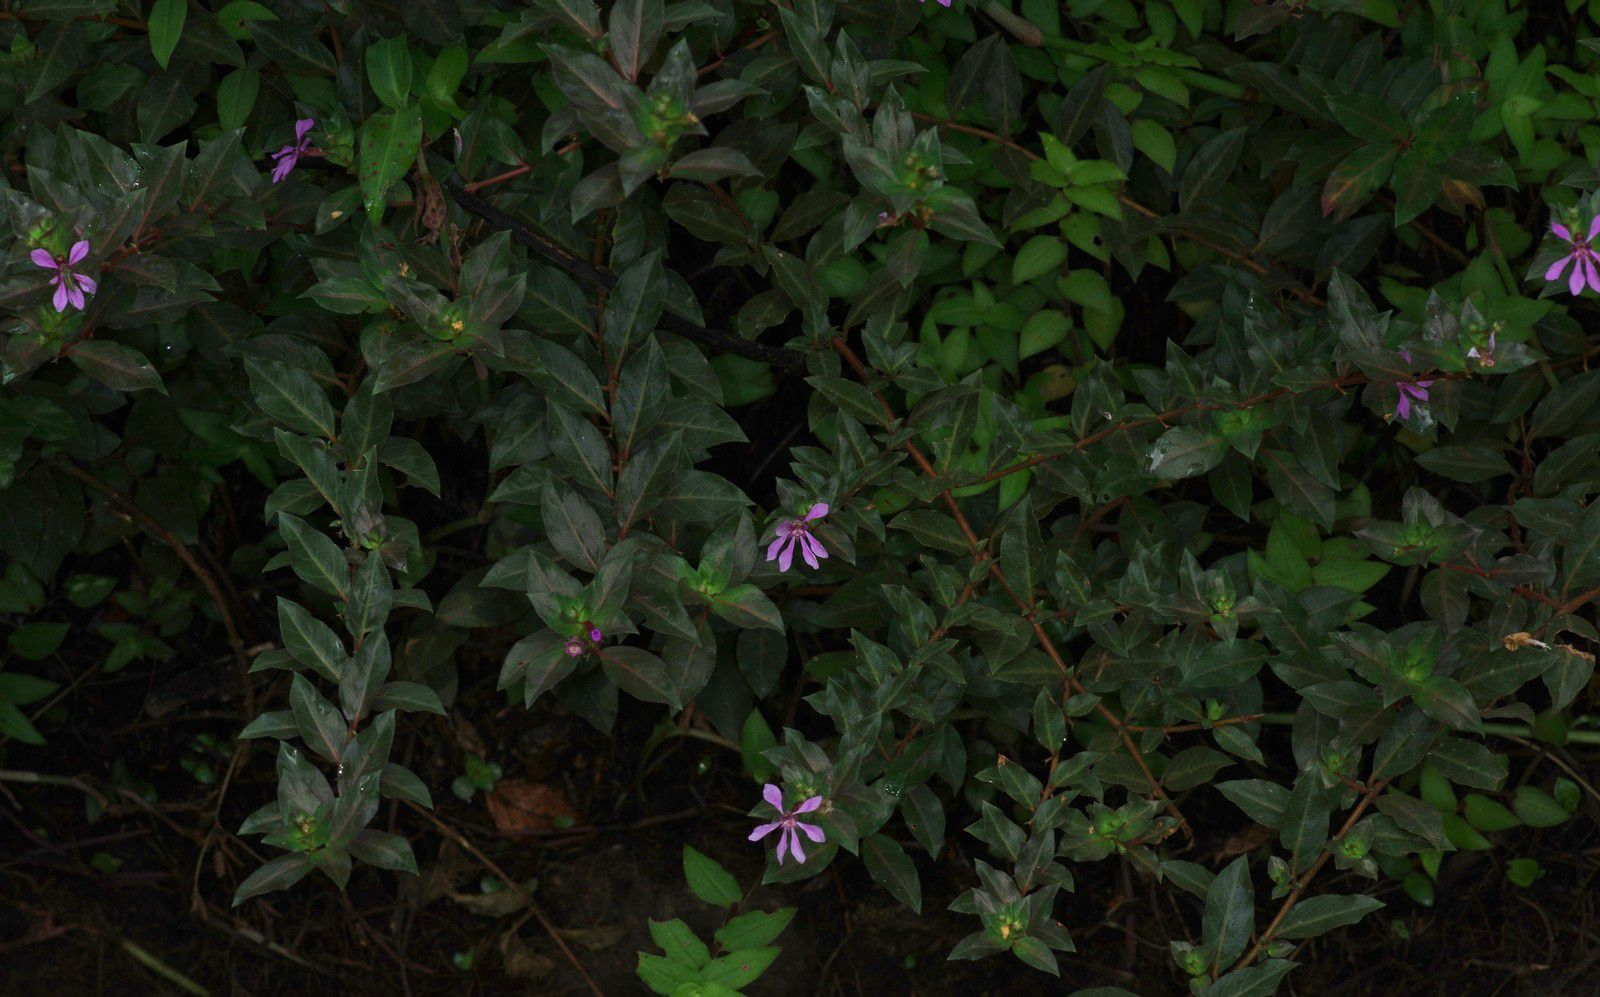 Cuphea carthagenensis (radié raide)